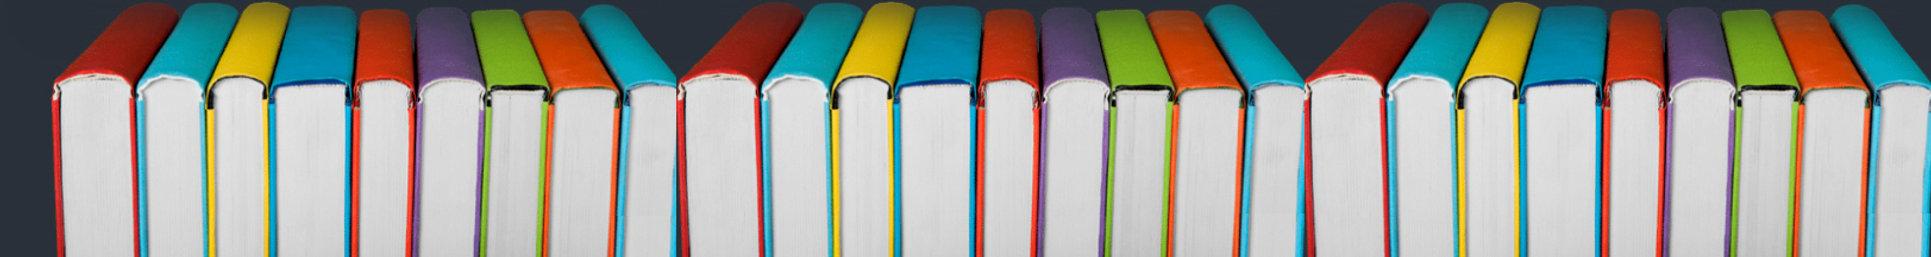 Library Books Background.jpg